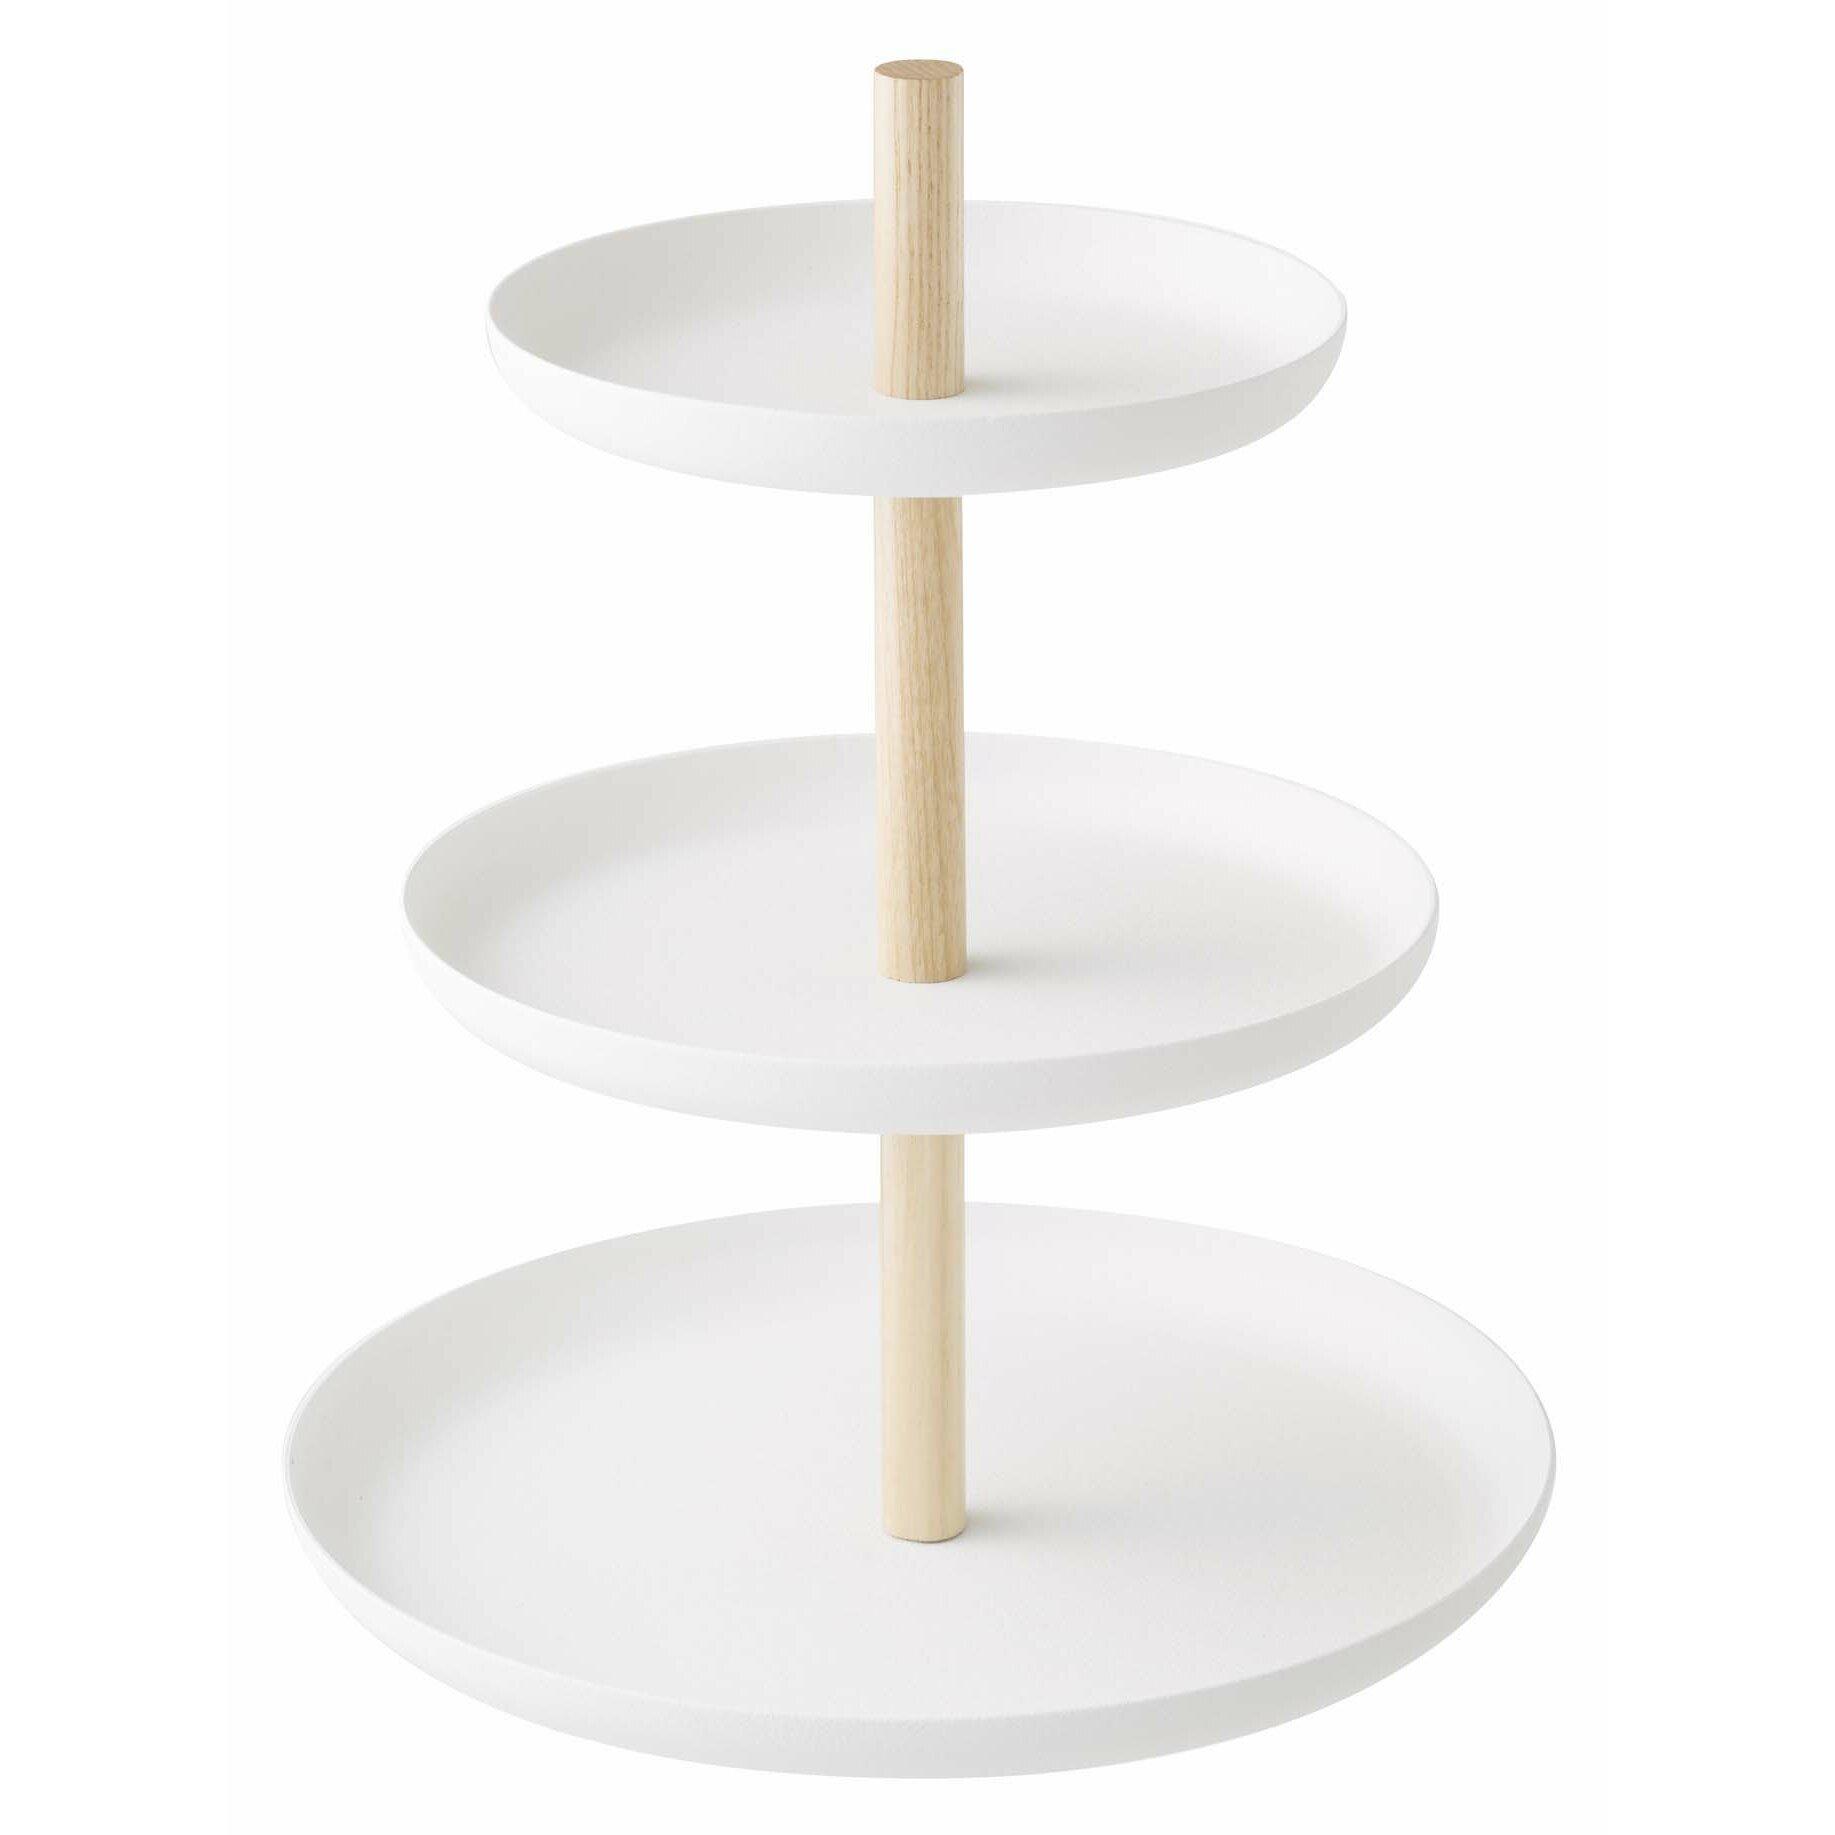 Yamazaki usa tosca 3 tiered cake stand reviews wayfair - Corbeille a fruits 3 etages ...